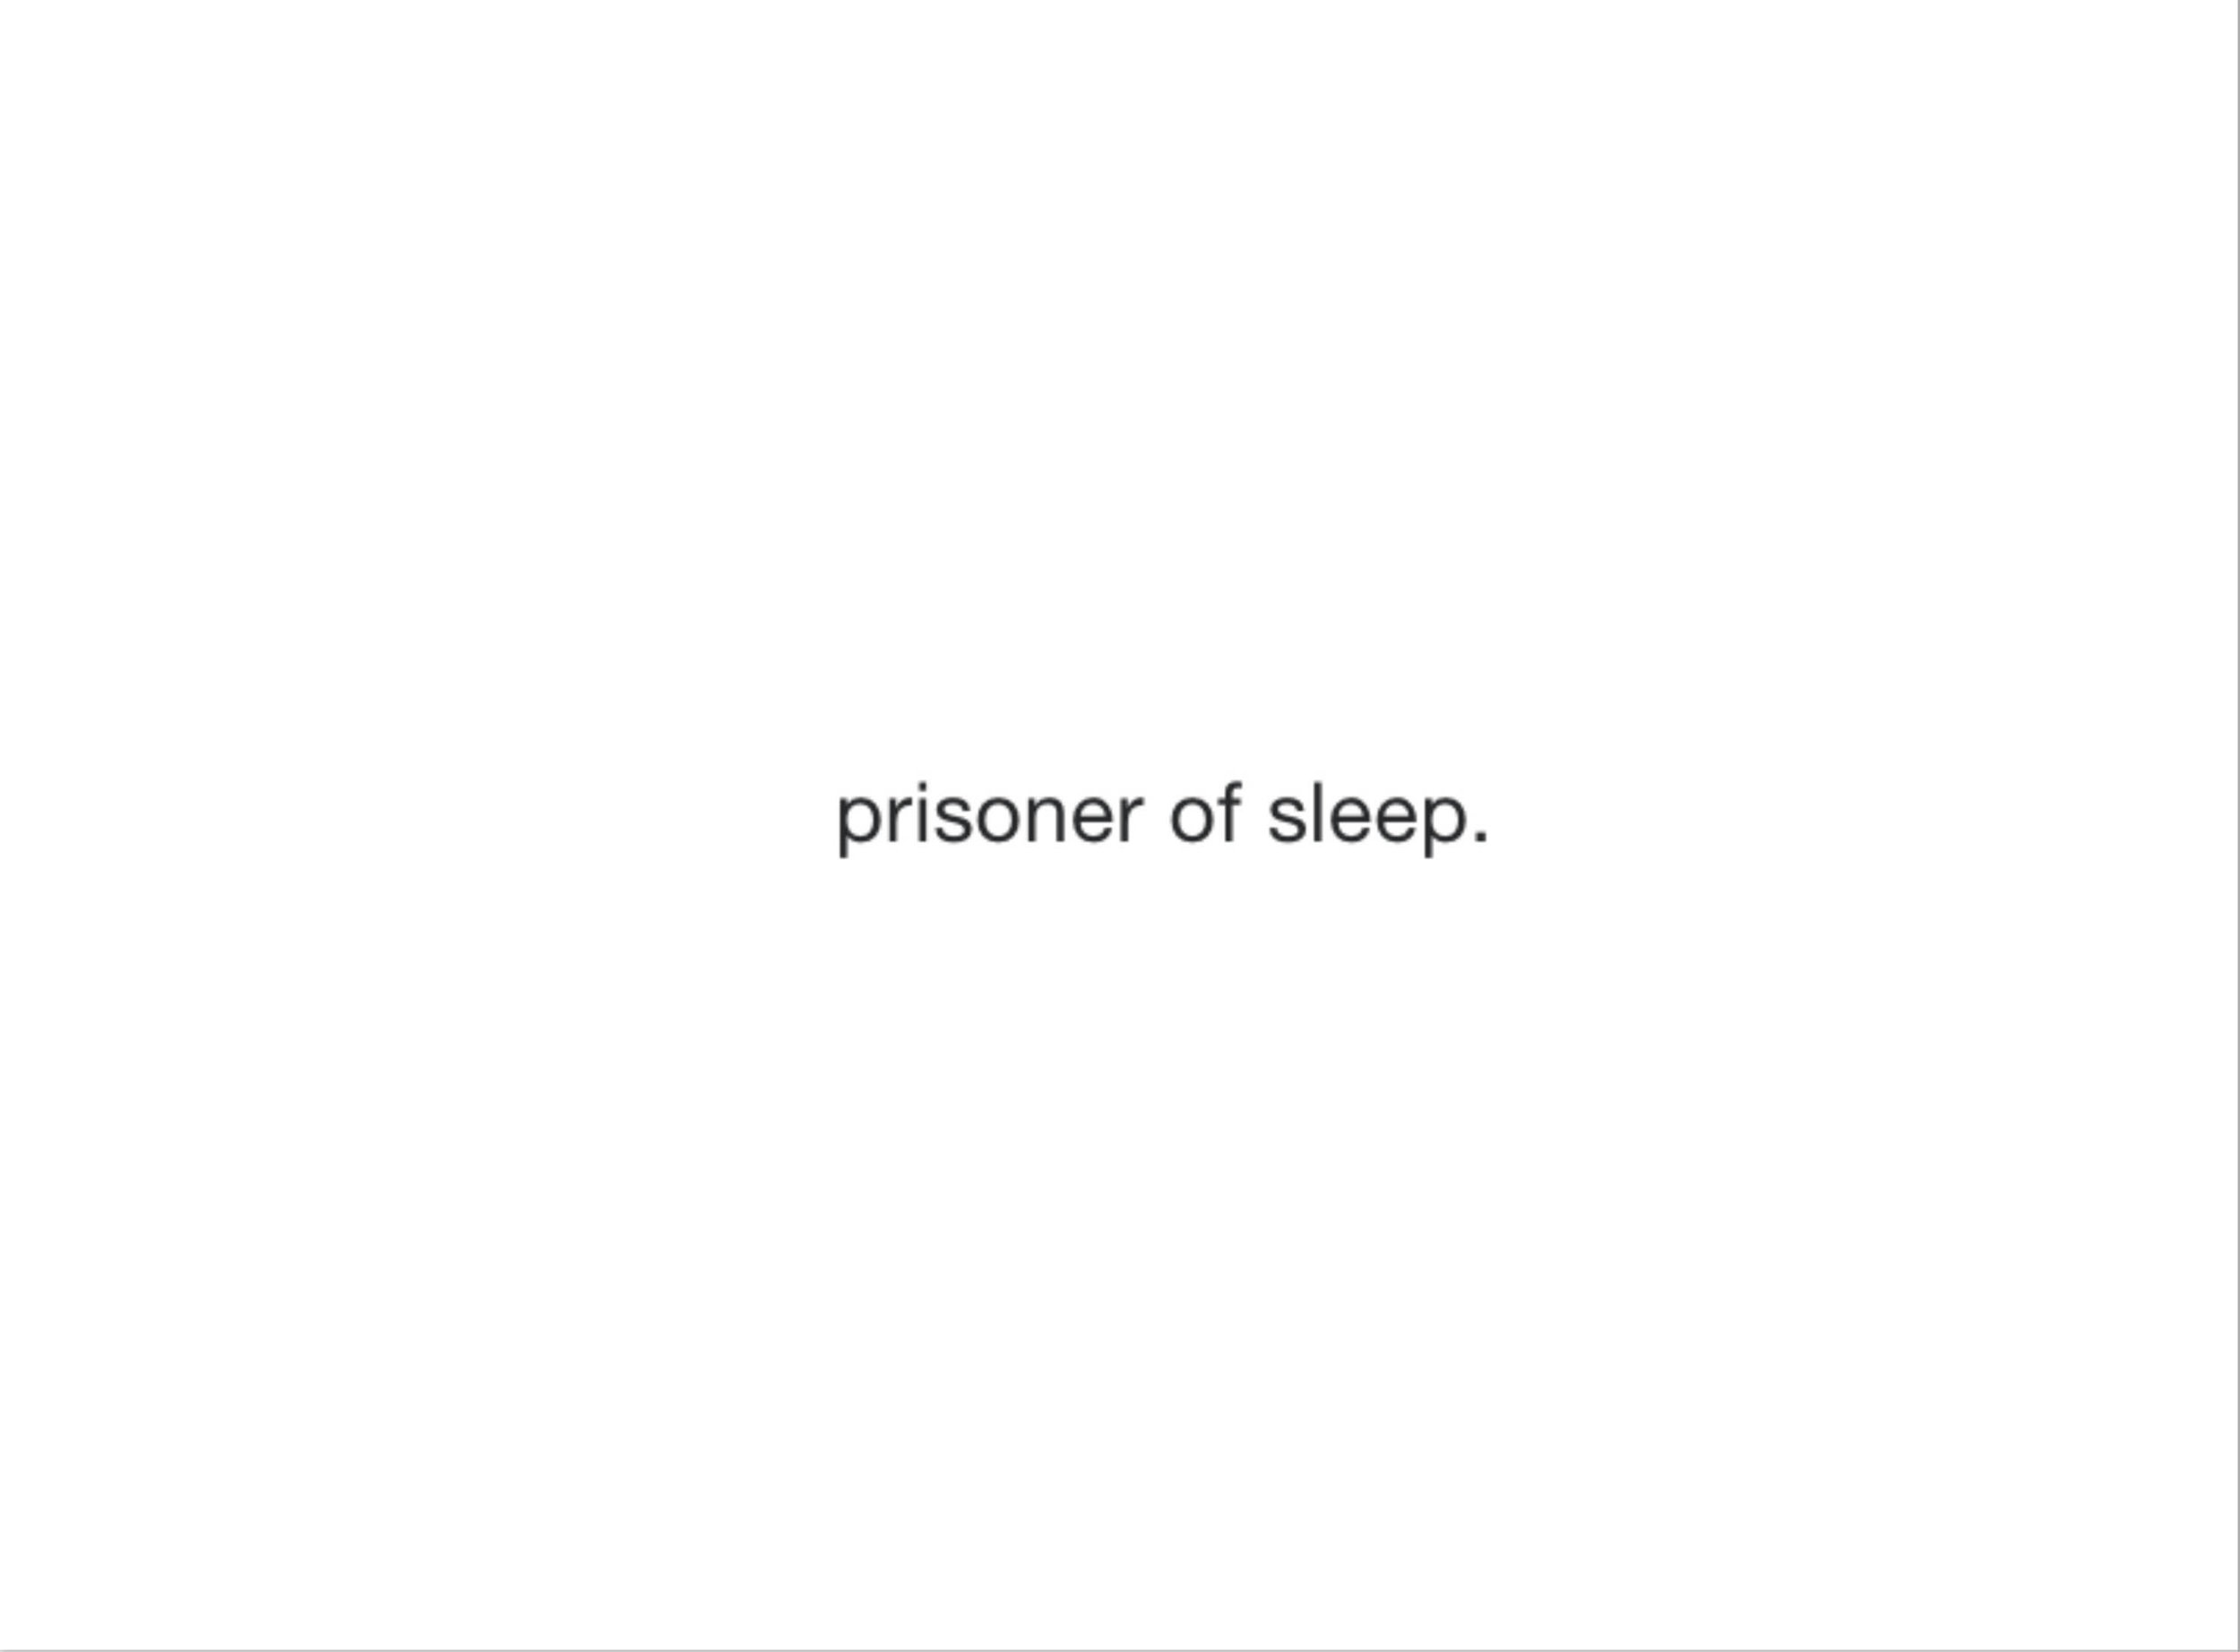 Sam Sutton Prisoner Of Sleep-5.jpg